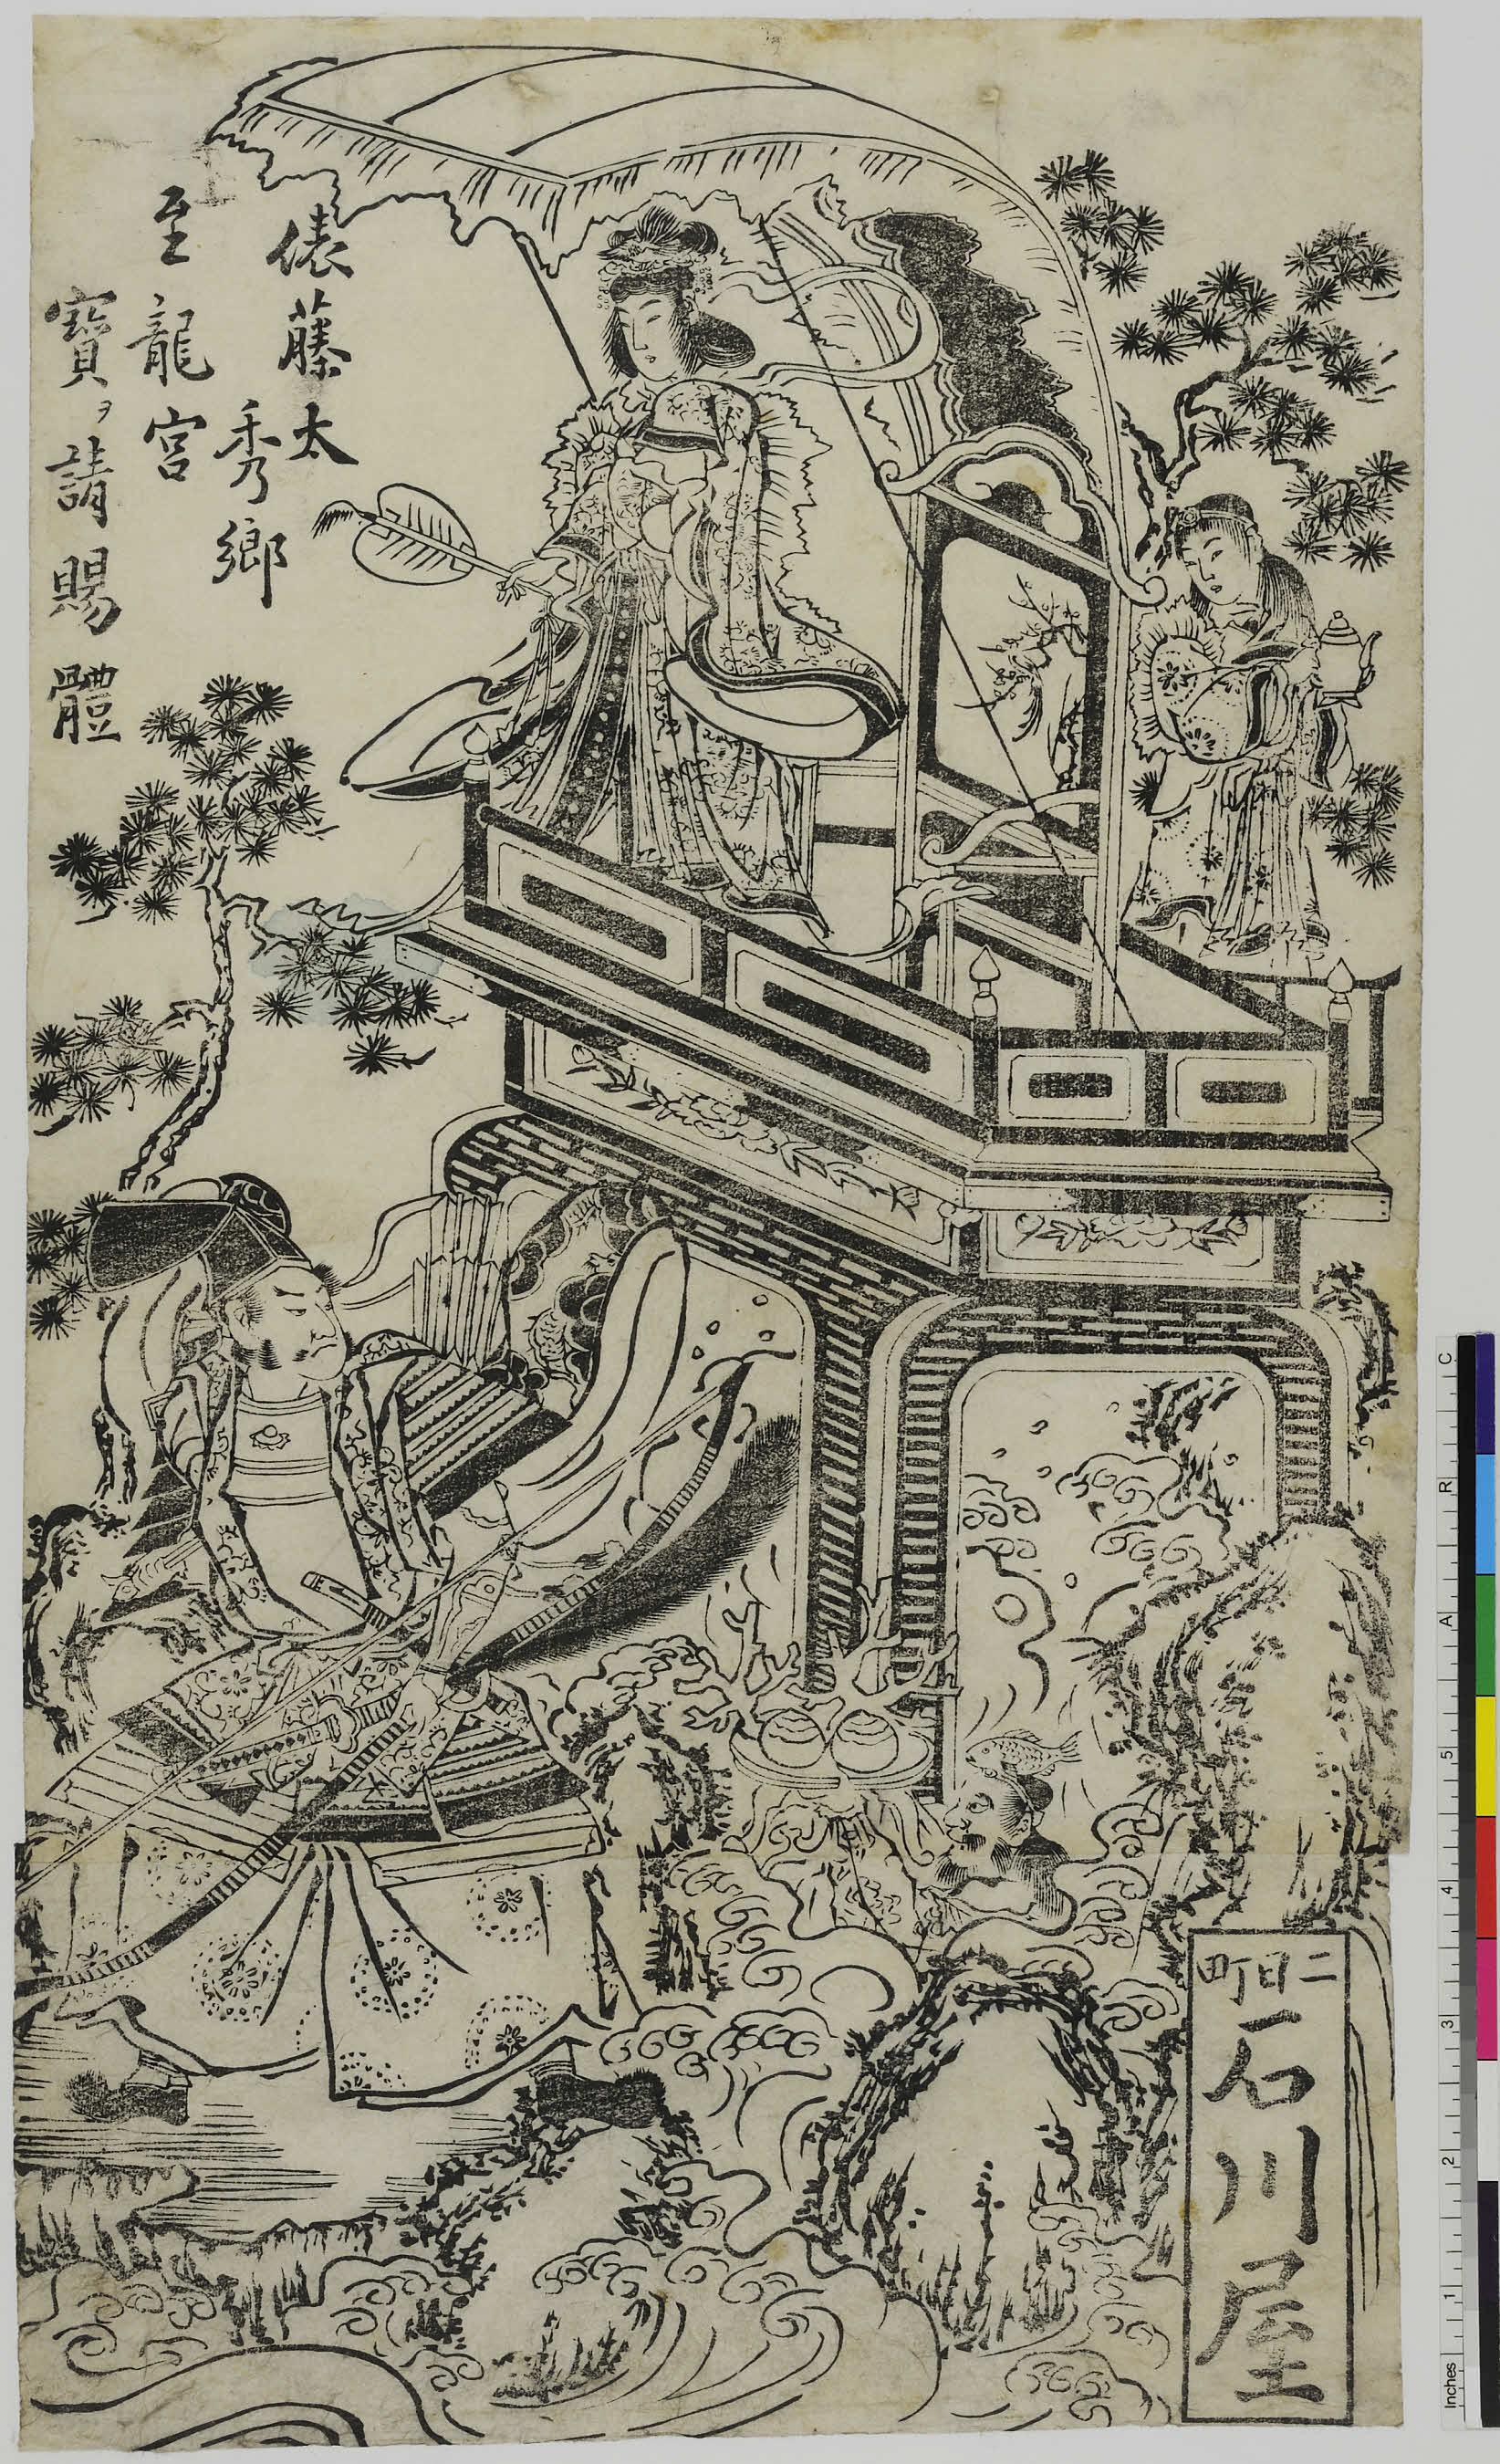 A1-5 俵藤太伝説の竜女